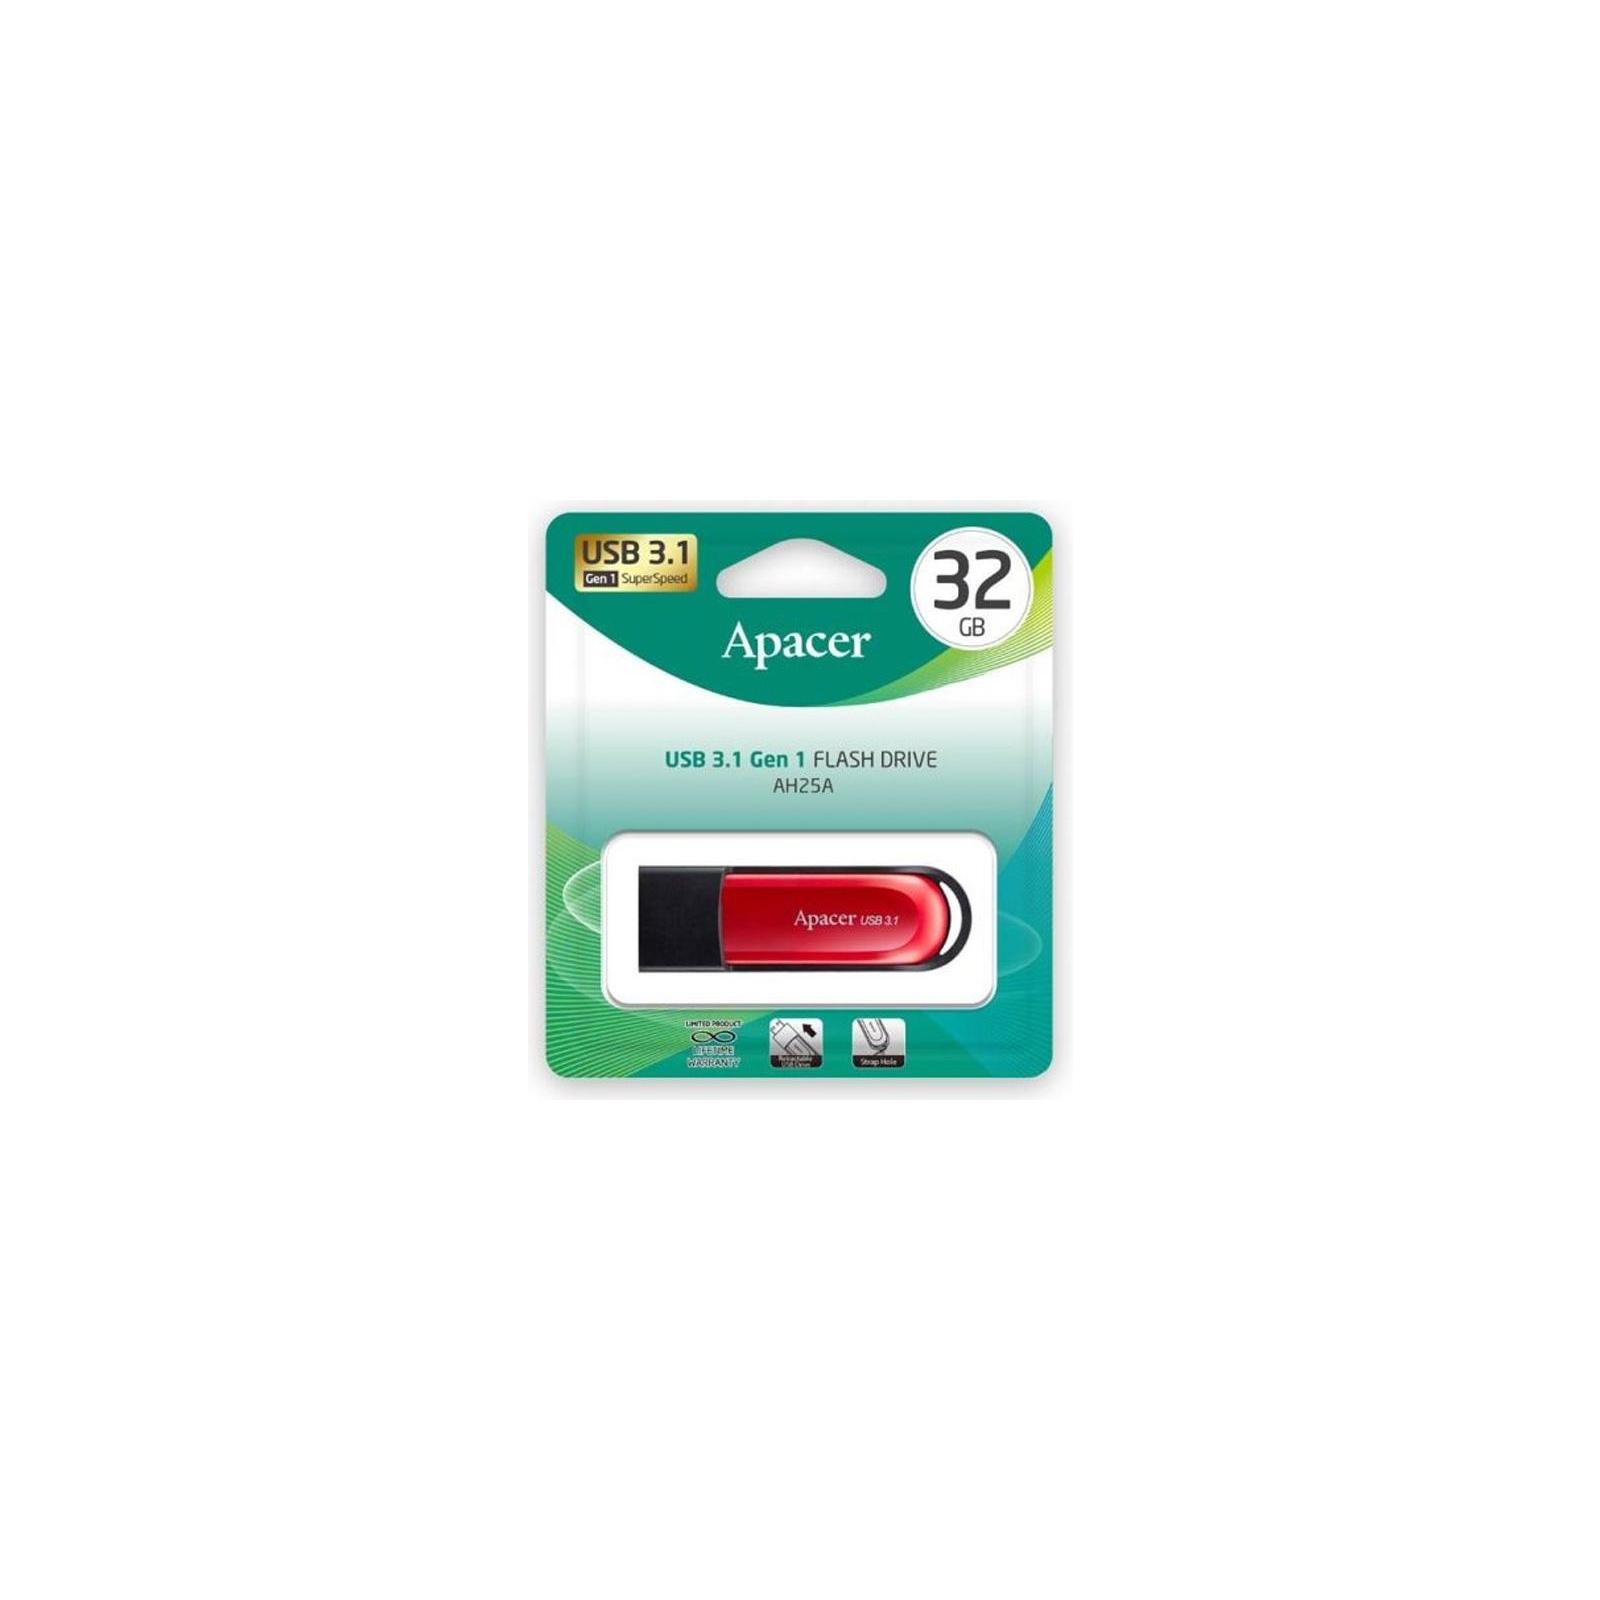 USB флеш накопитель Apacer 32GB AH25A Black USB 3.1 Gen1 (AP32GAH25AB-1) изображение 5